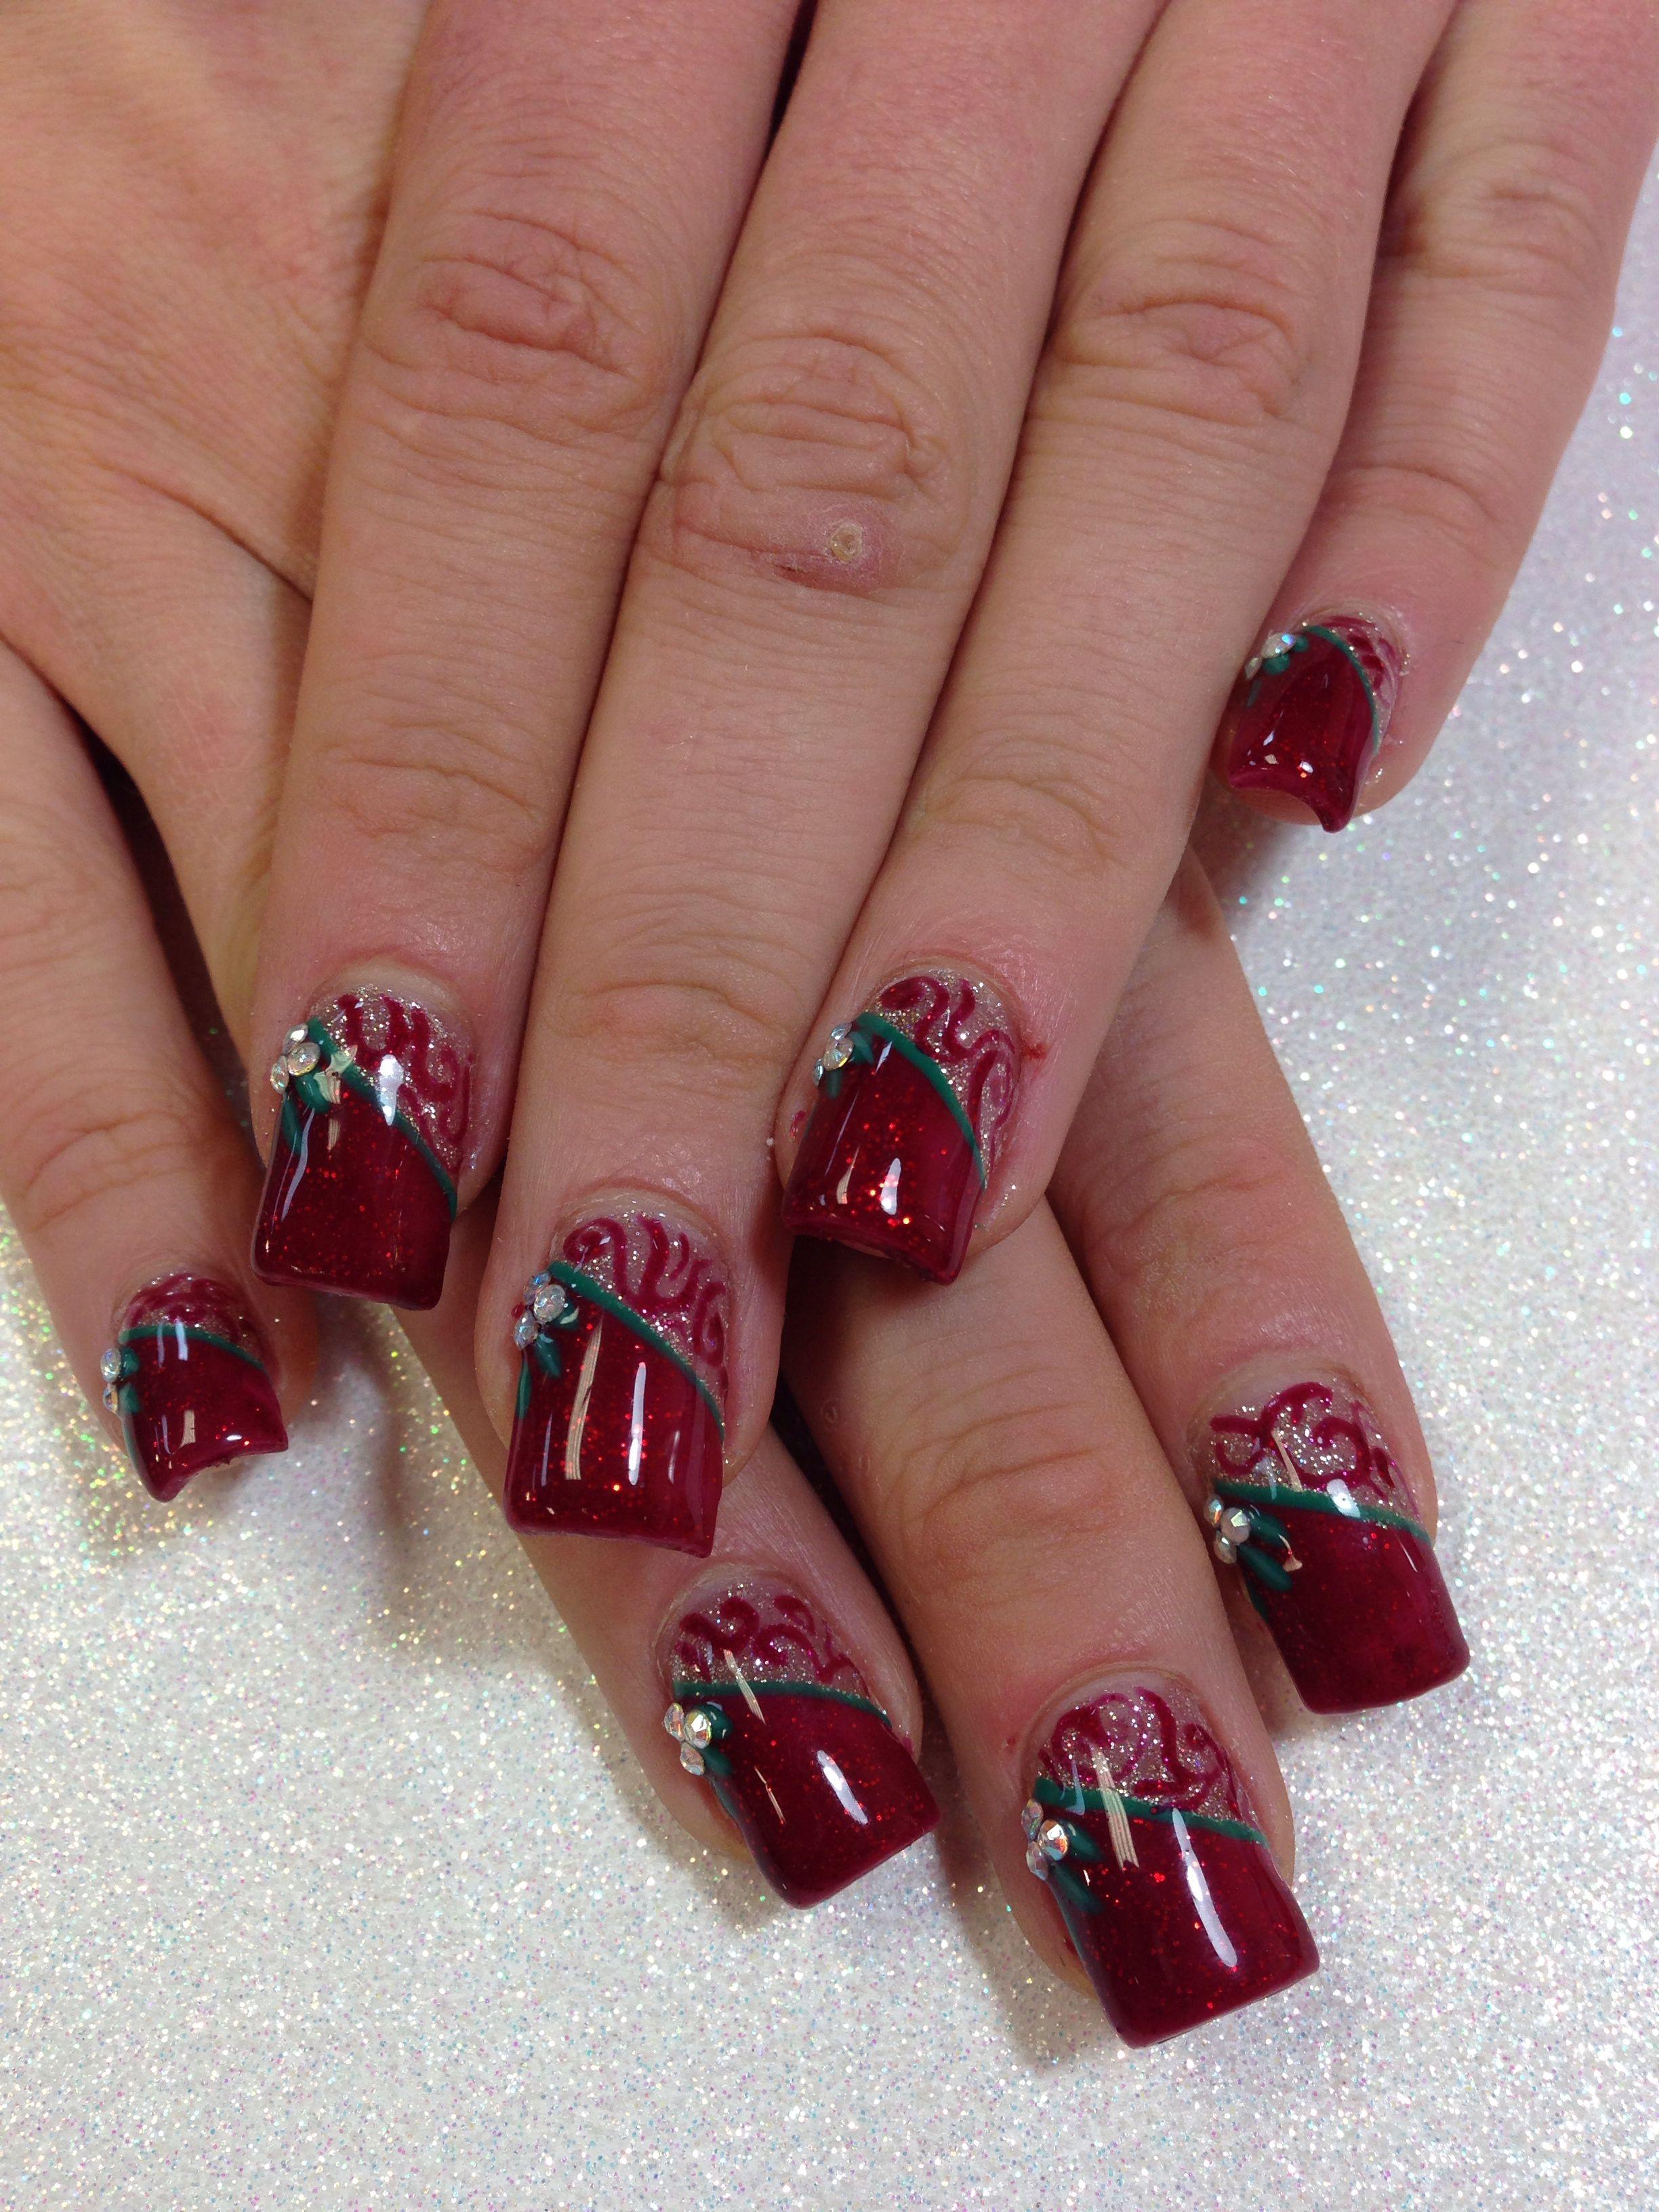 Holiday gel manicure! | Twist on regular French manicure | Pinterest